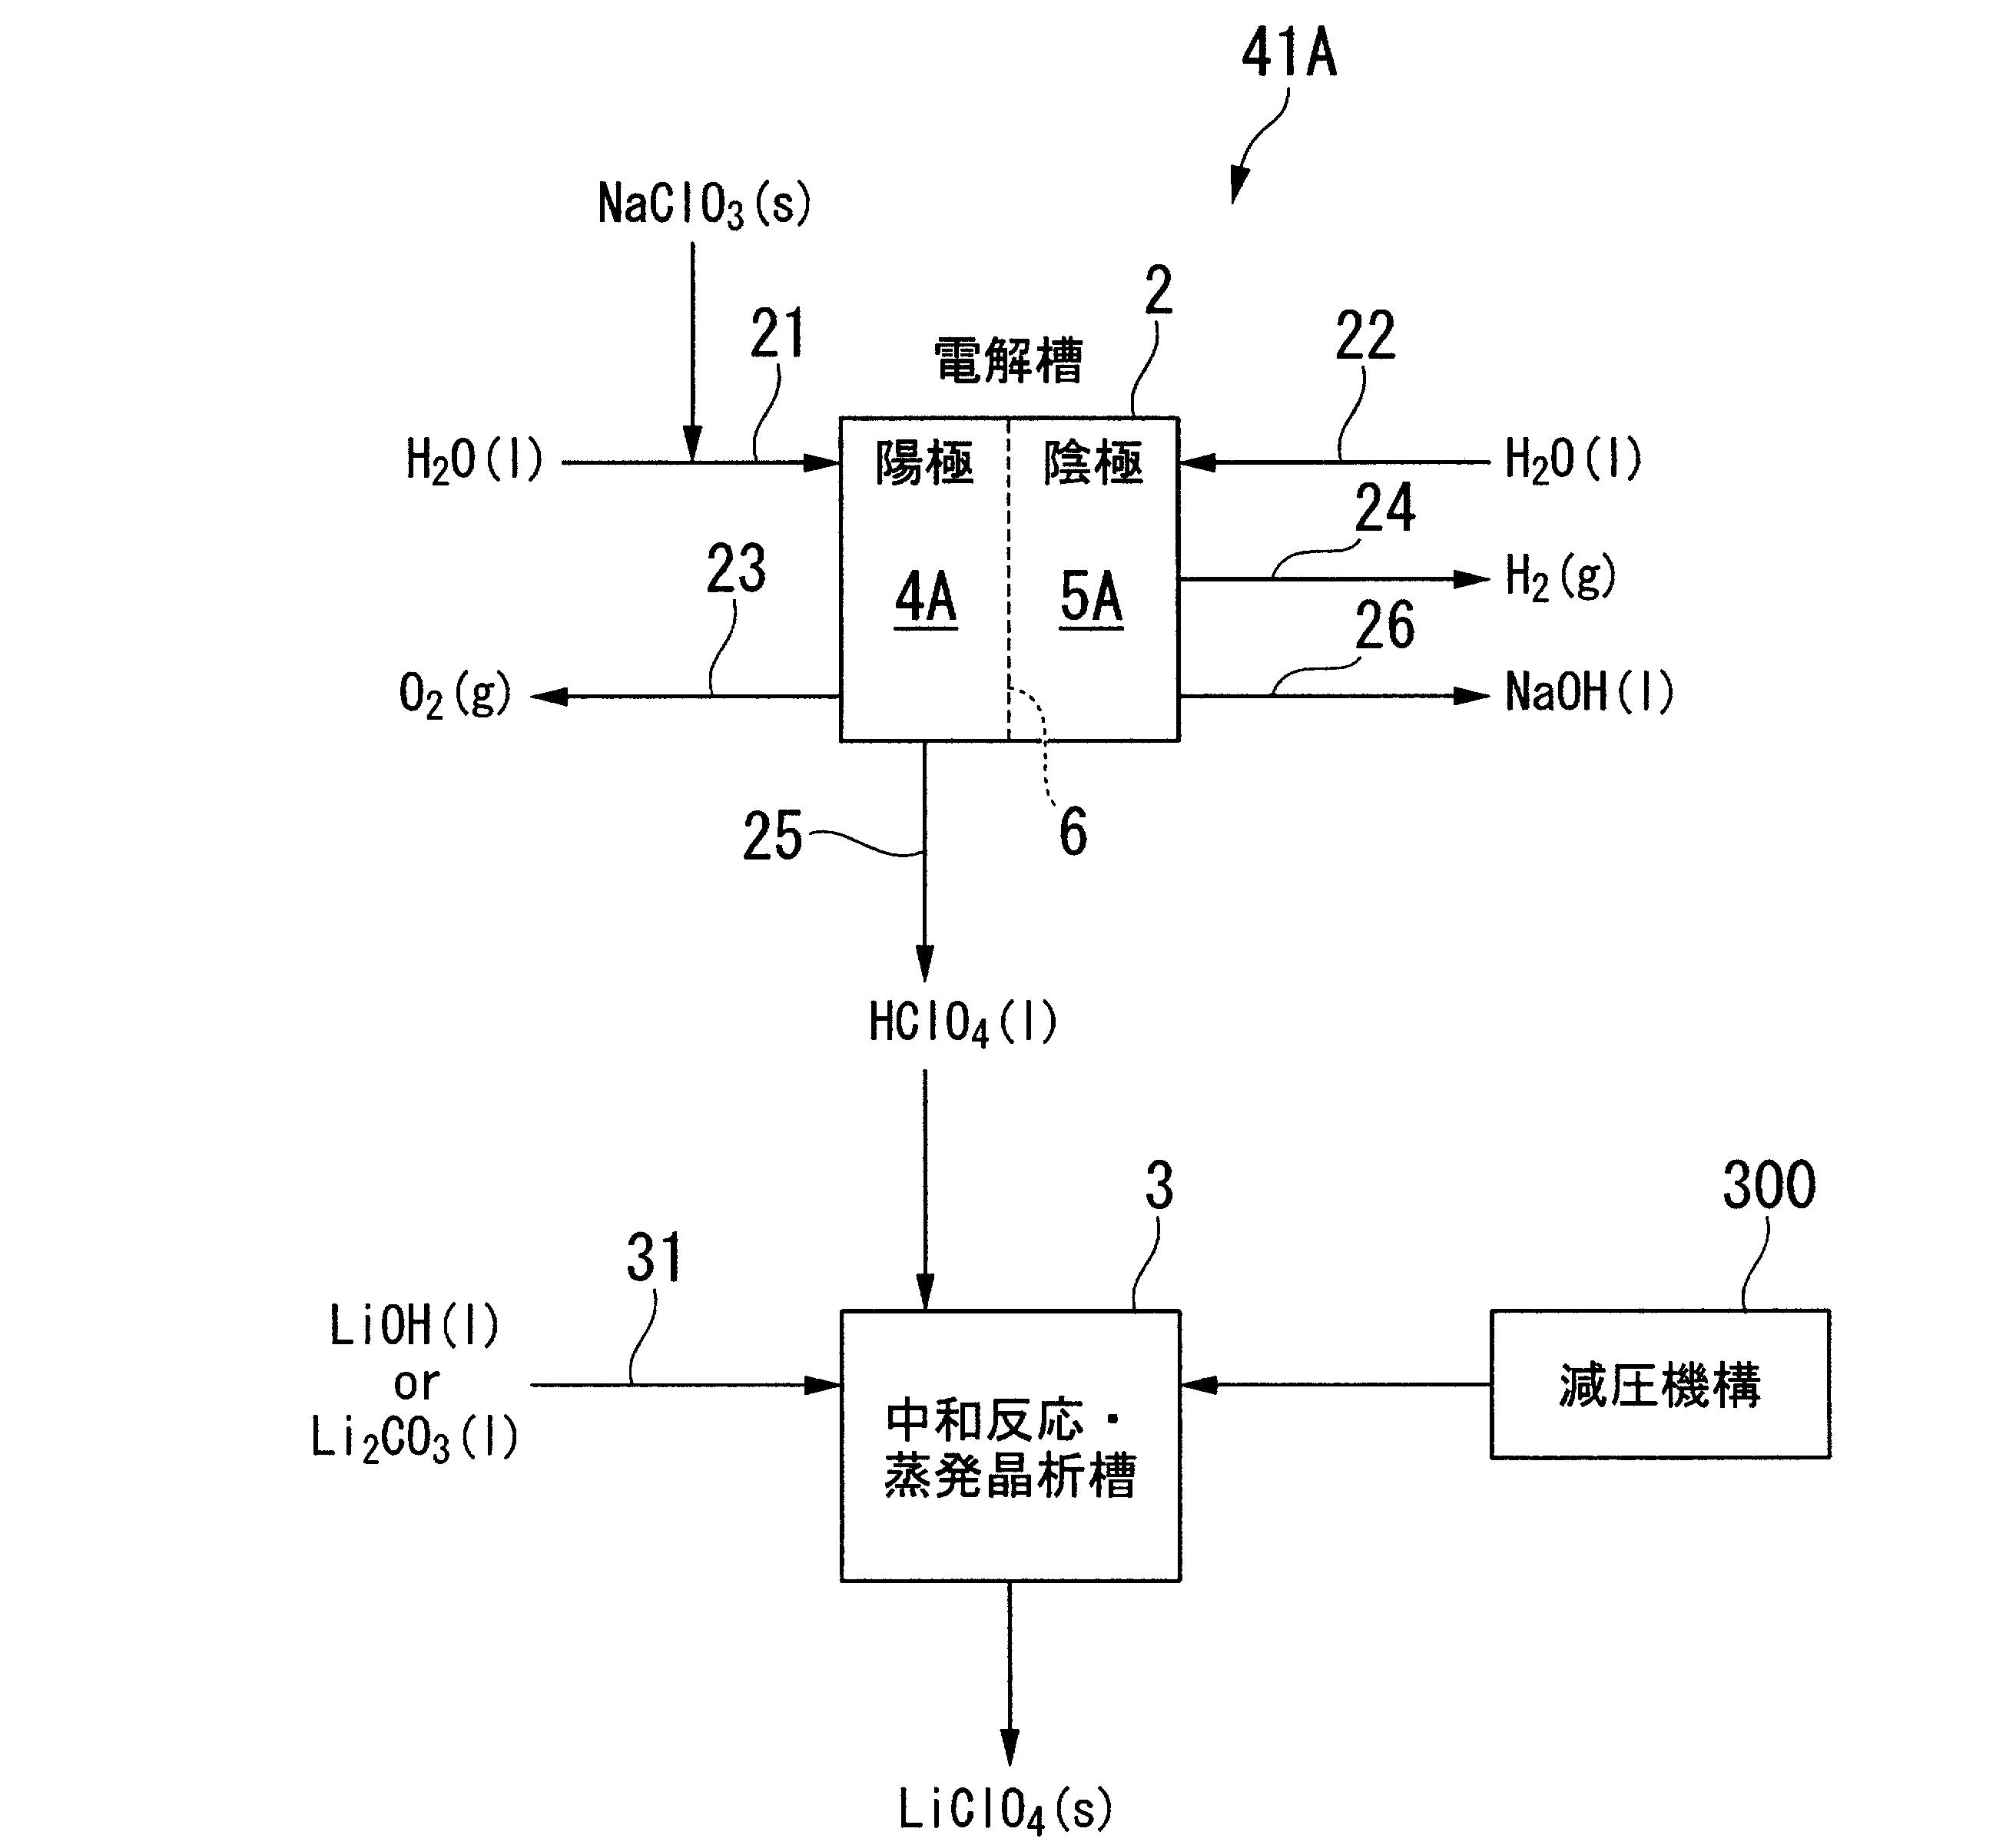 WO2010109922A1 - 過塩素酸塩の製造方法及び製造装置         - Google PatentsFamily